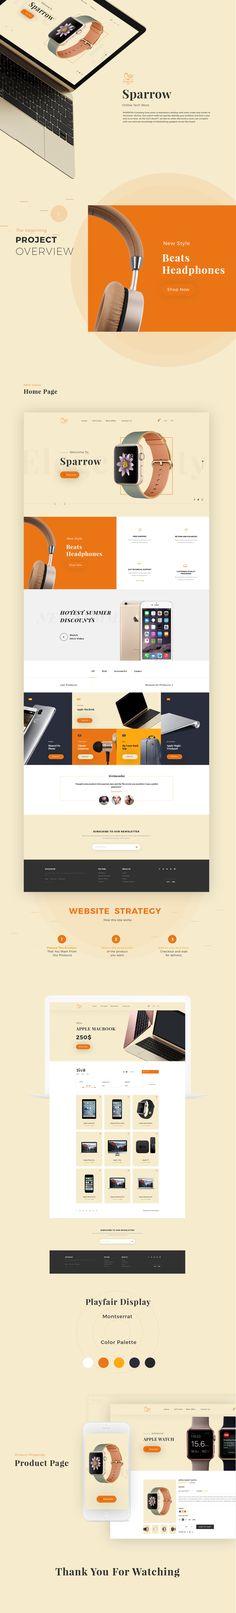 Sparrow Online Store Design on Behance